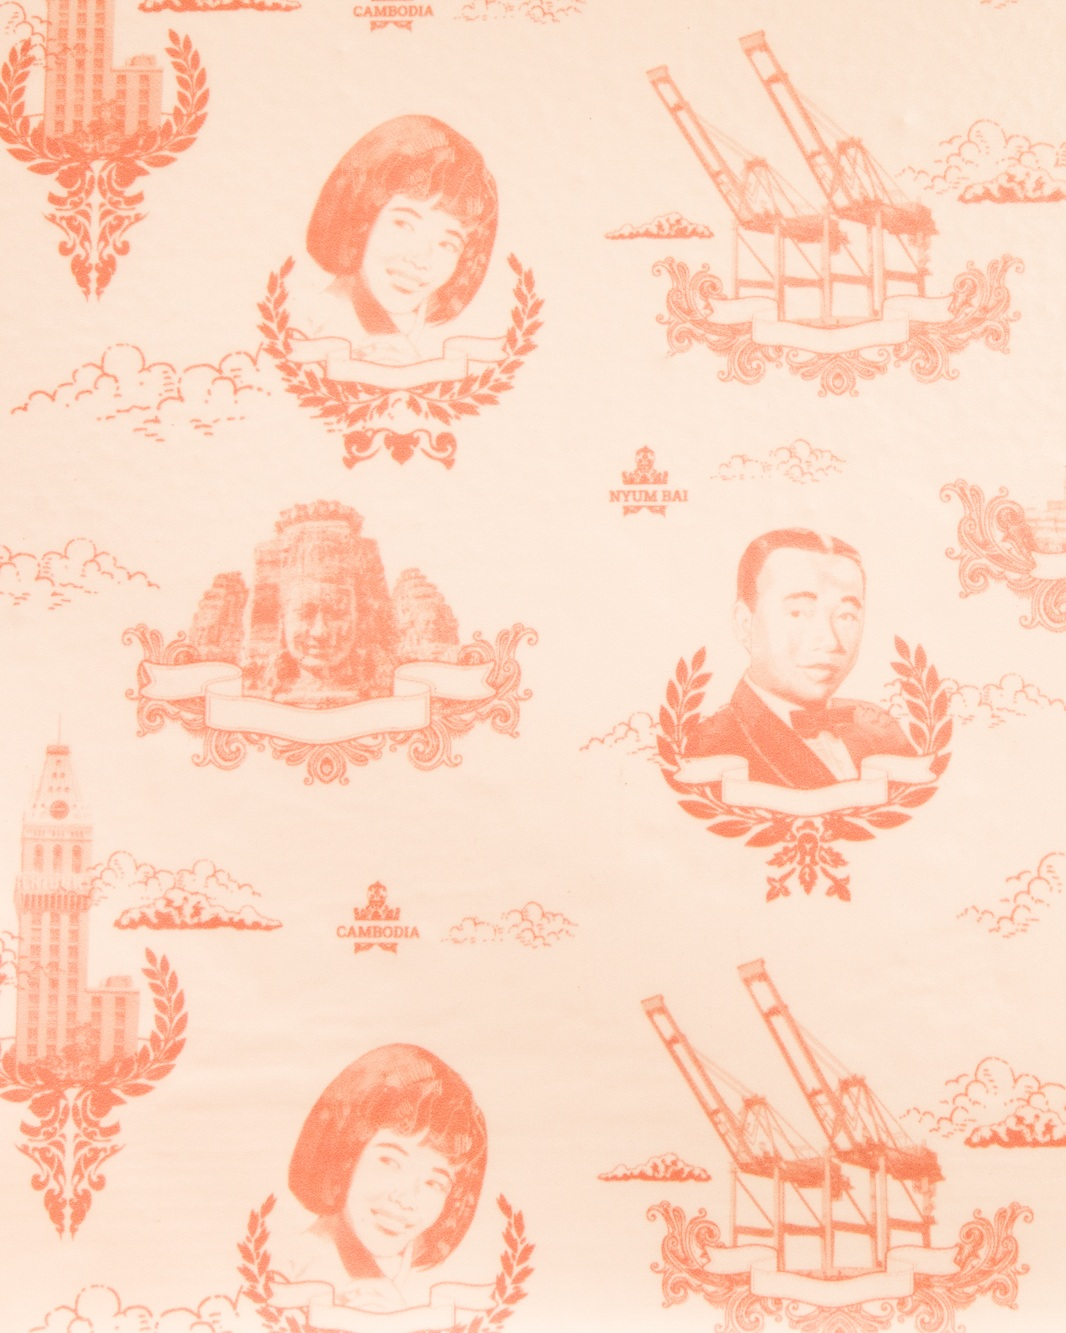 Photo of Nyum Bai vintage tock n' roll wallpaper by Patricia Chang